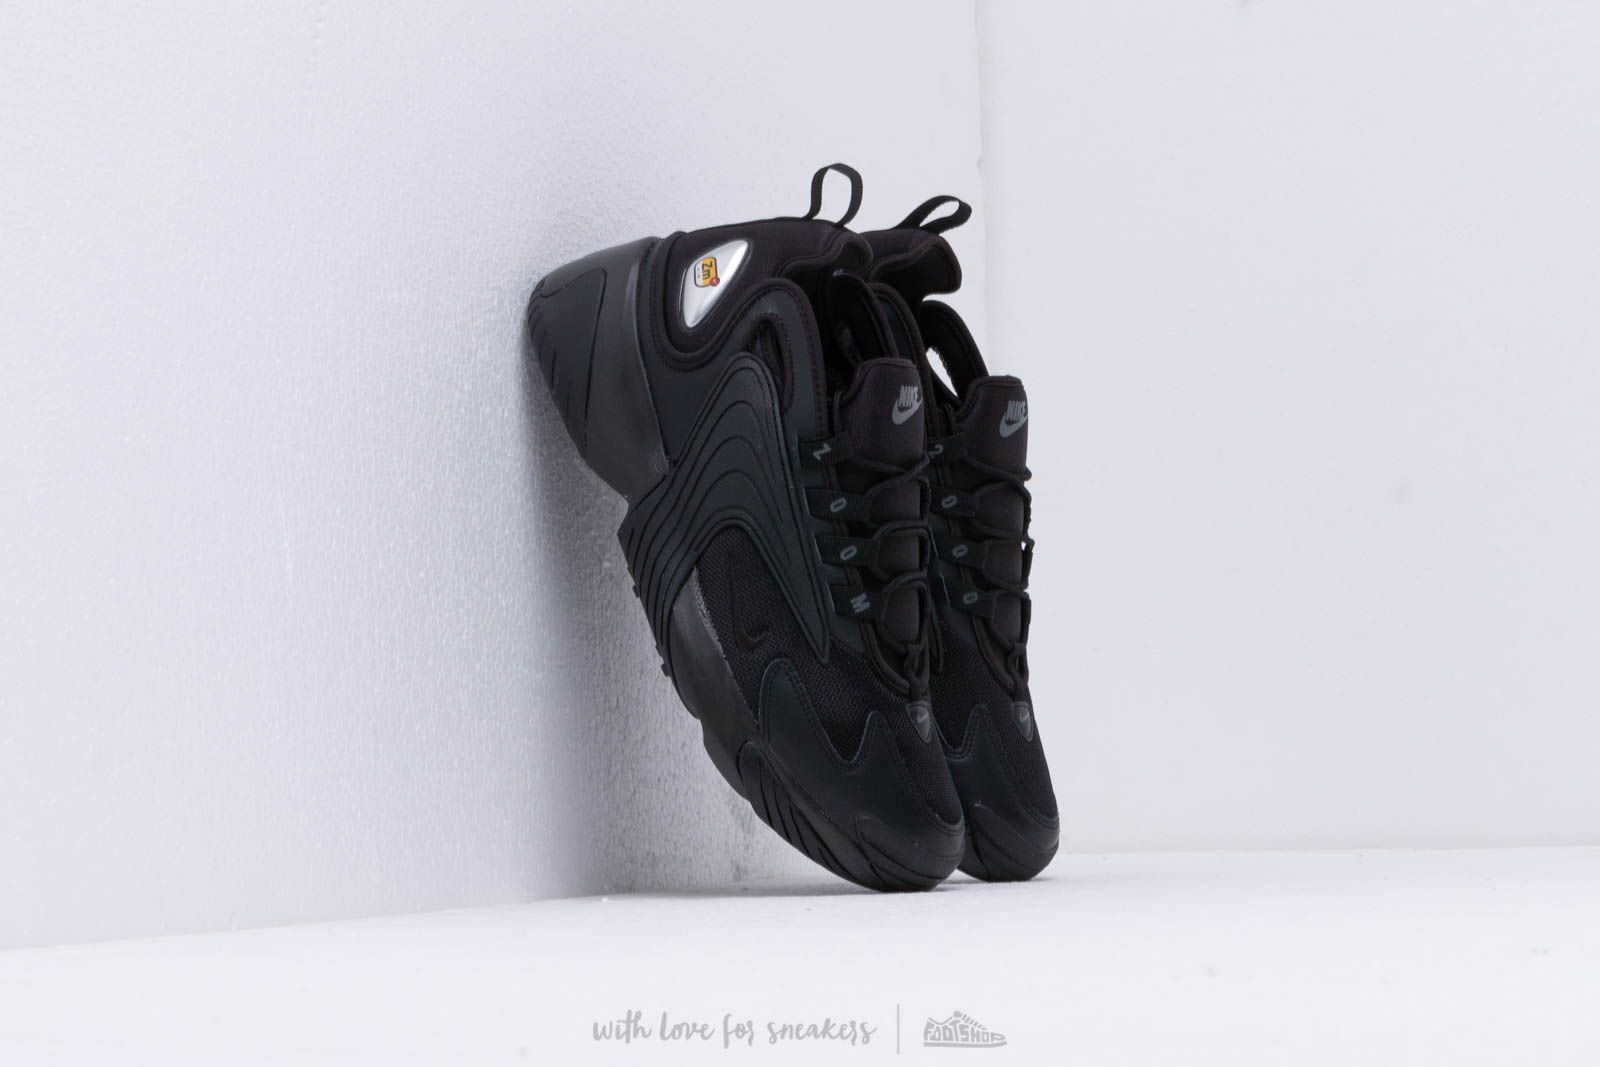 Chaussures et baskets homme Nike Zoom 2K Black/ Black-Anthracite